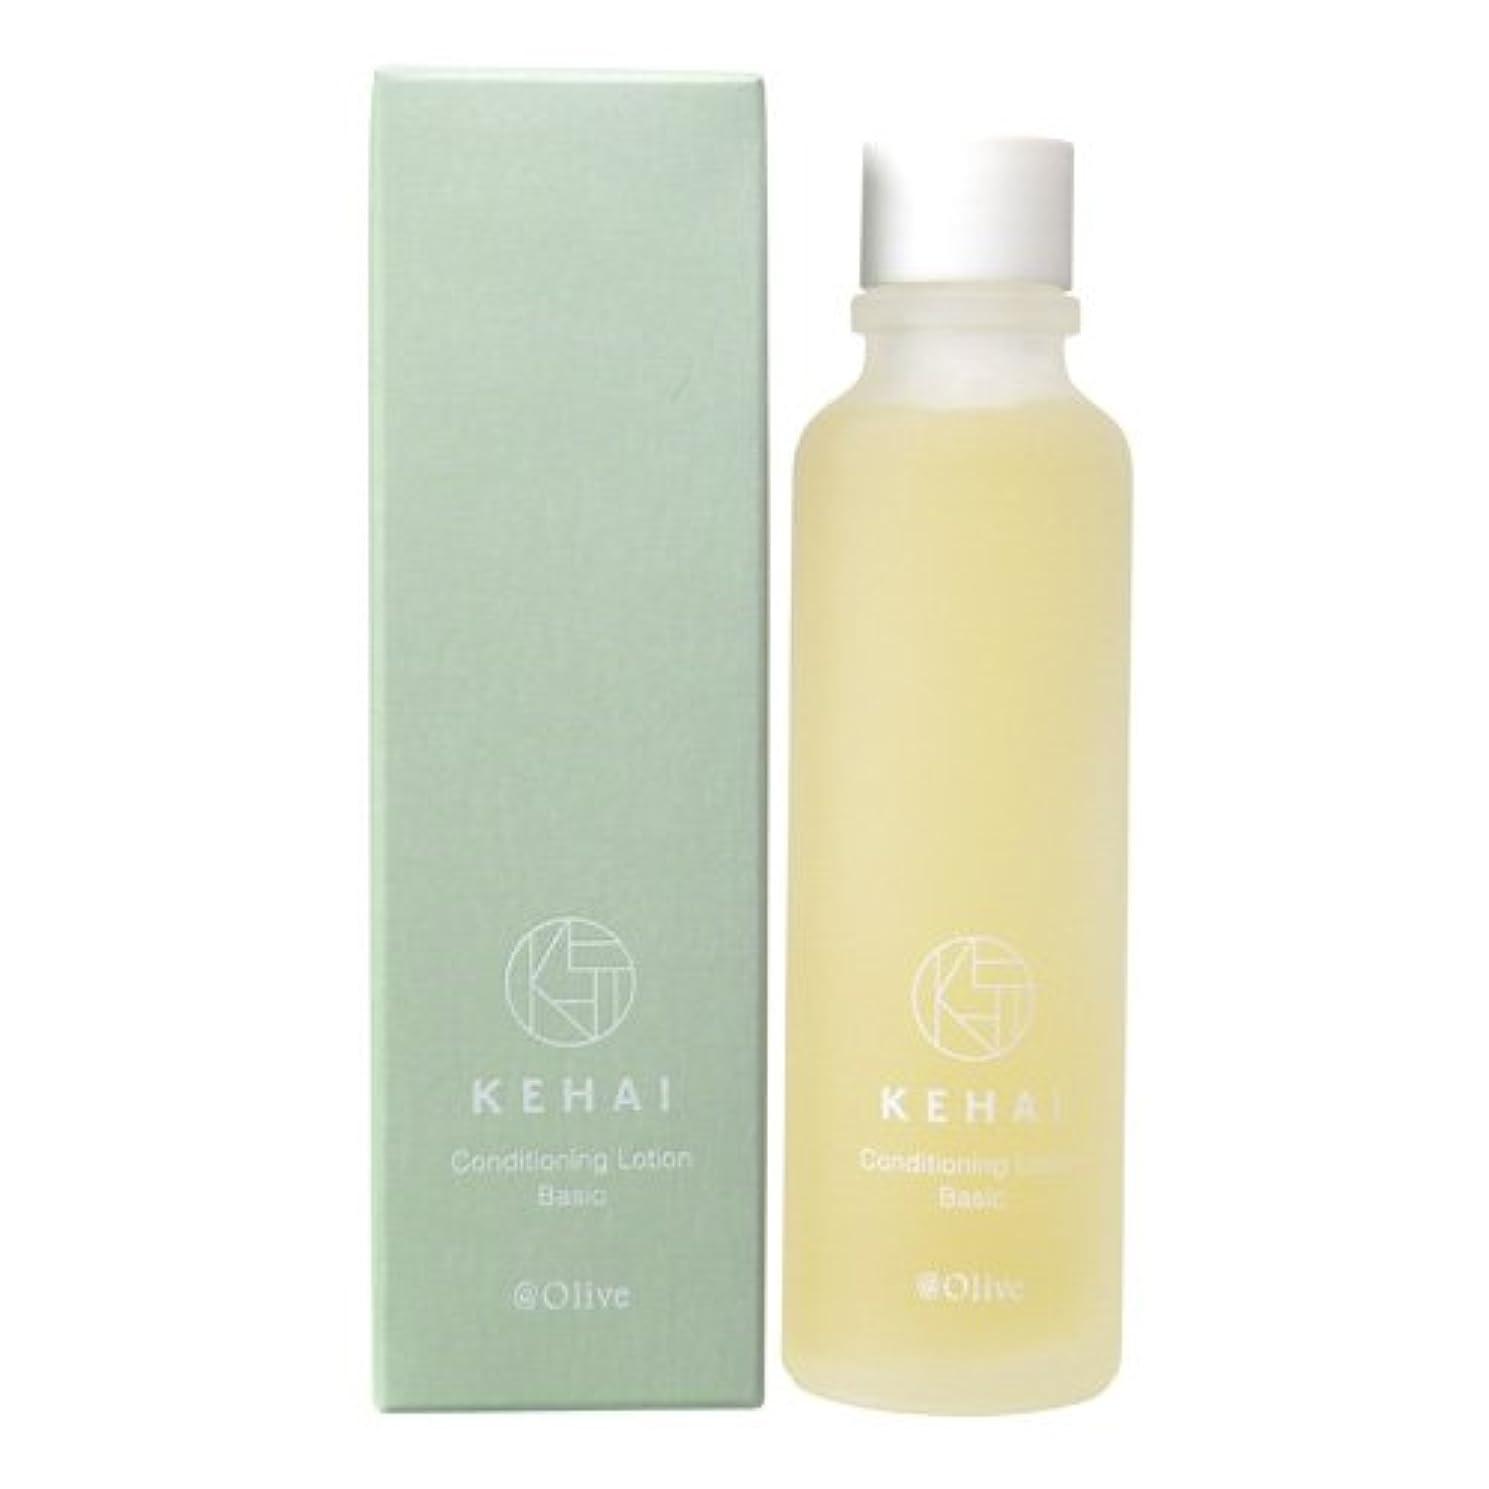 KEHAI コンディショニングローション ベーシック 〈化粧水〉 120ml